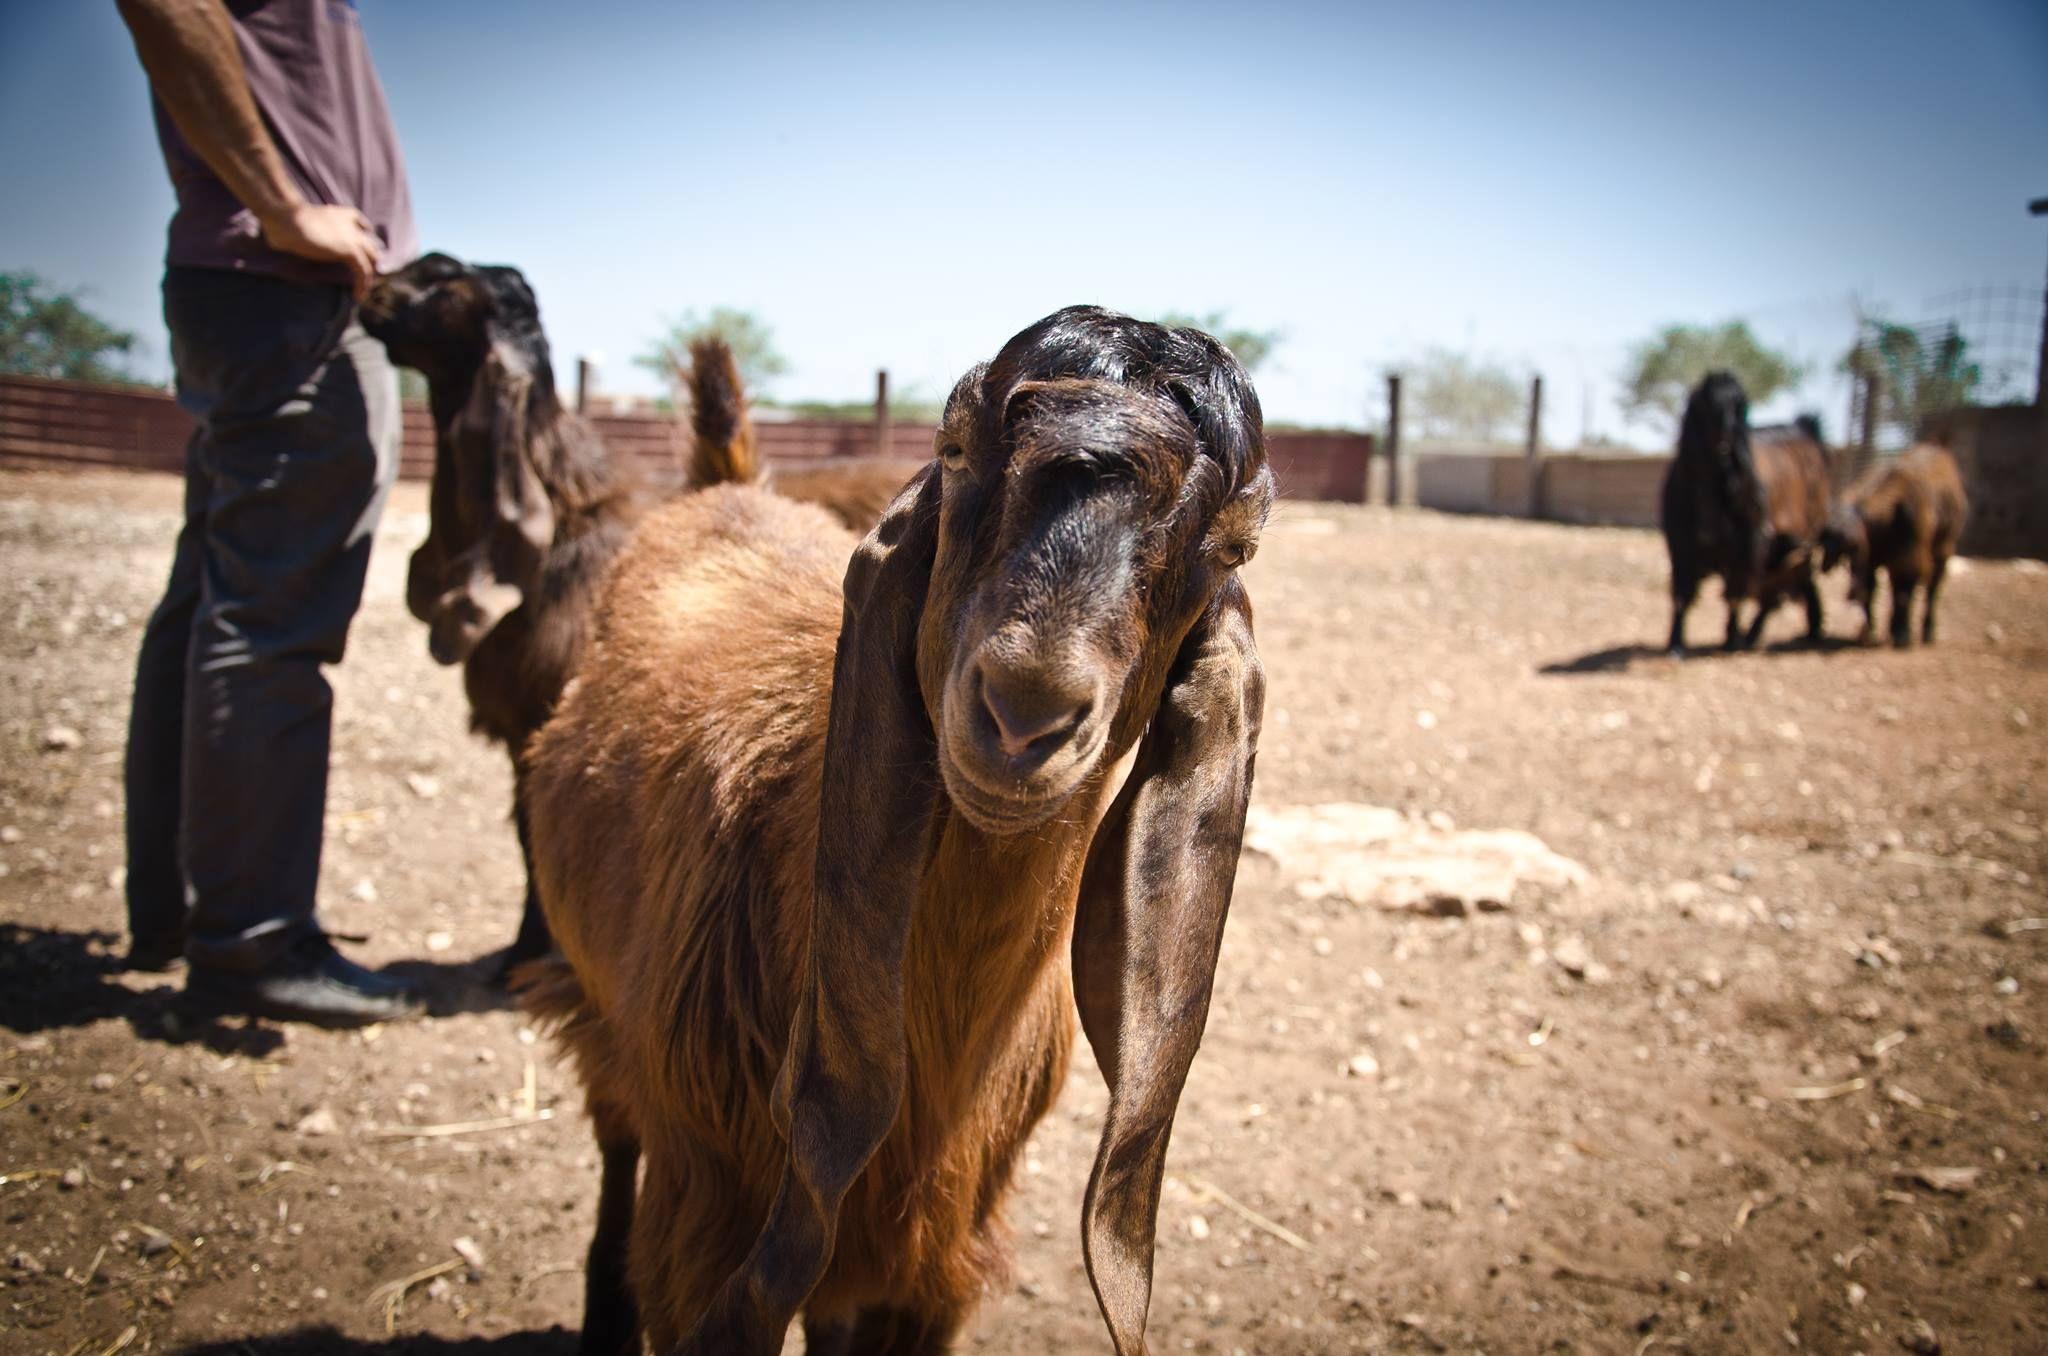 Damascus Goat - 0425